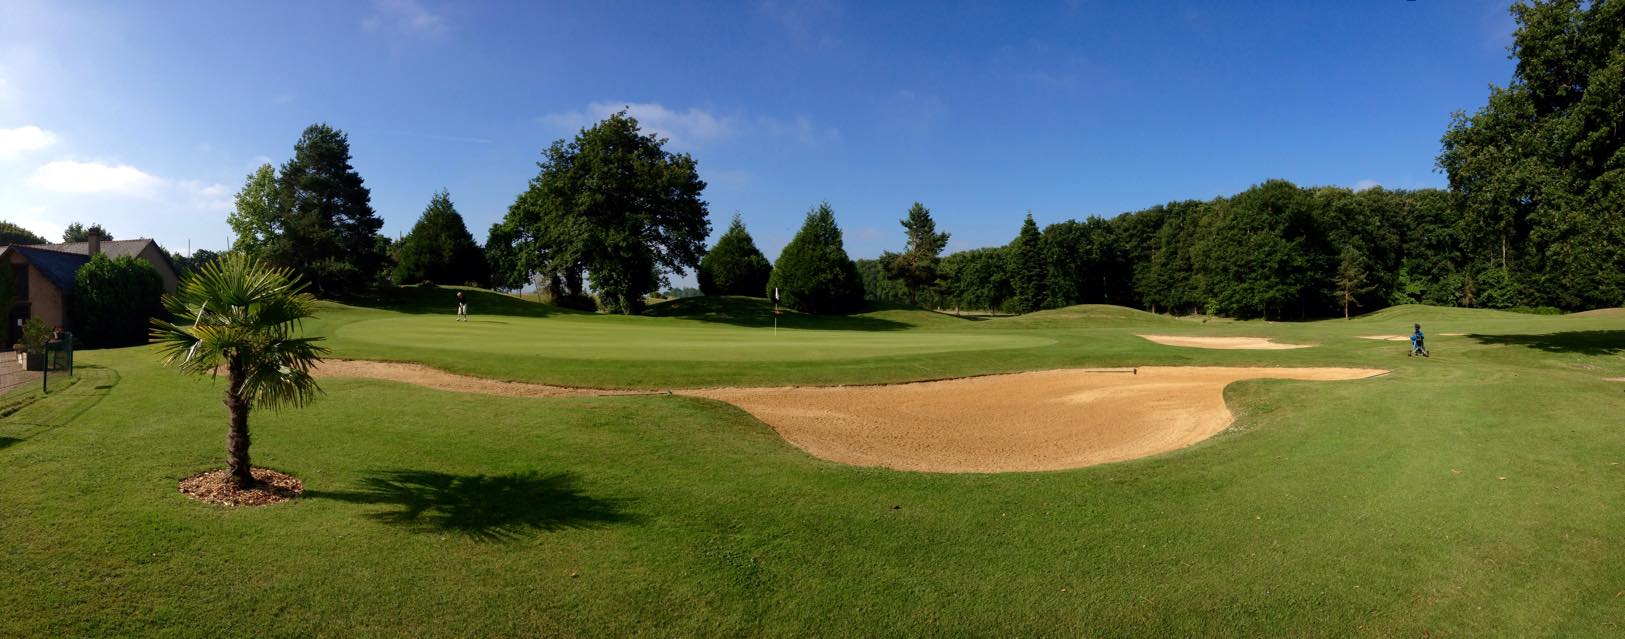 golf-freslonniere1